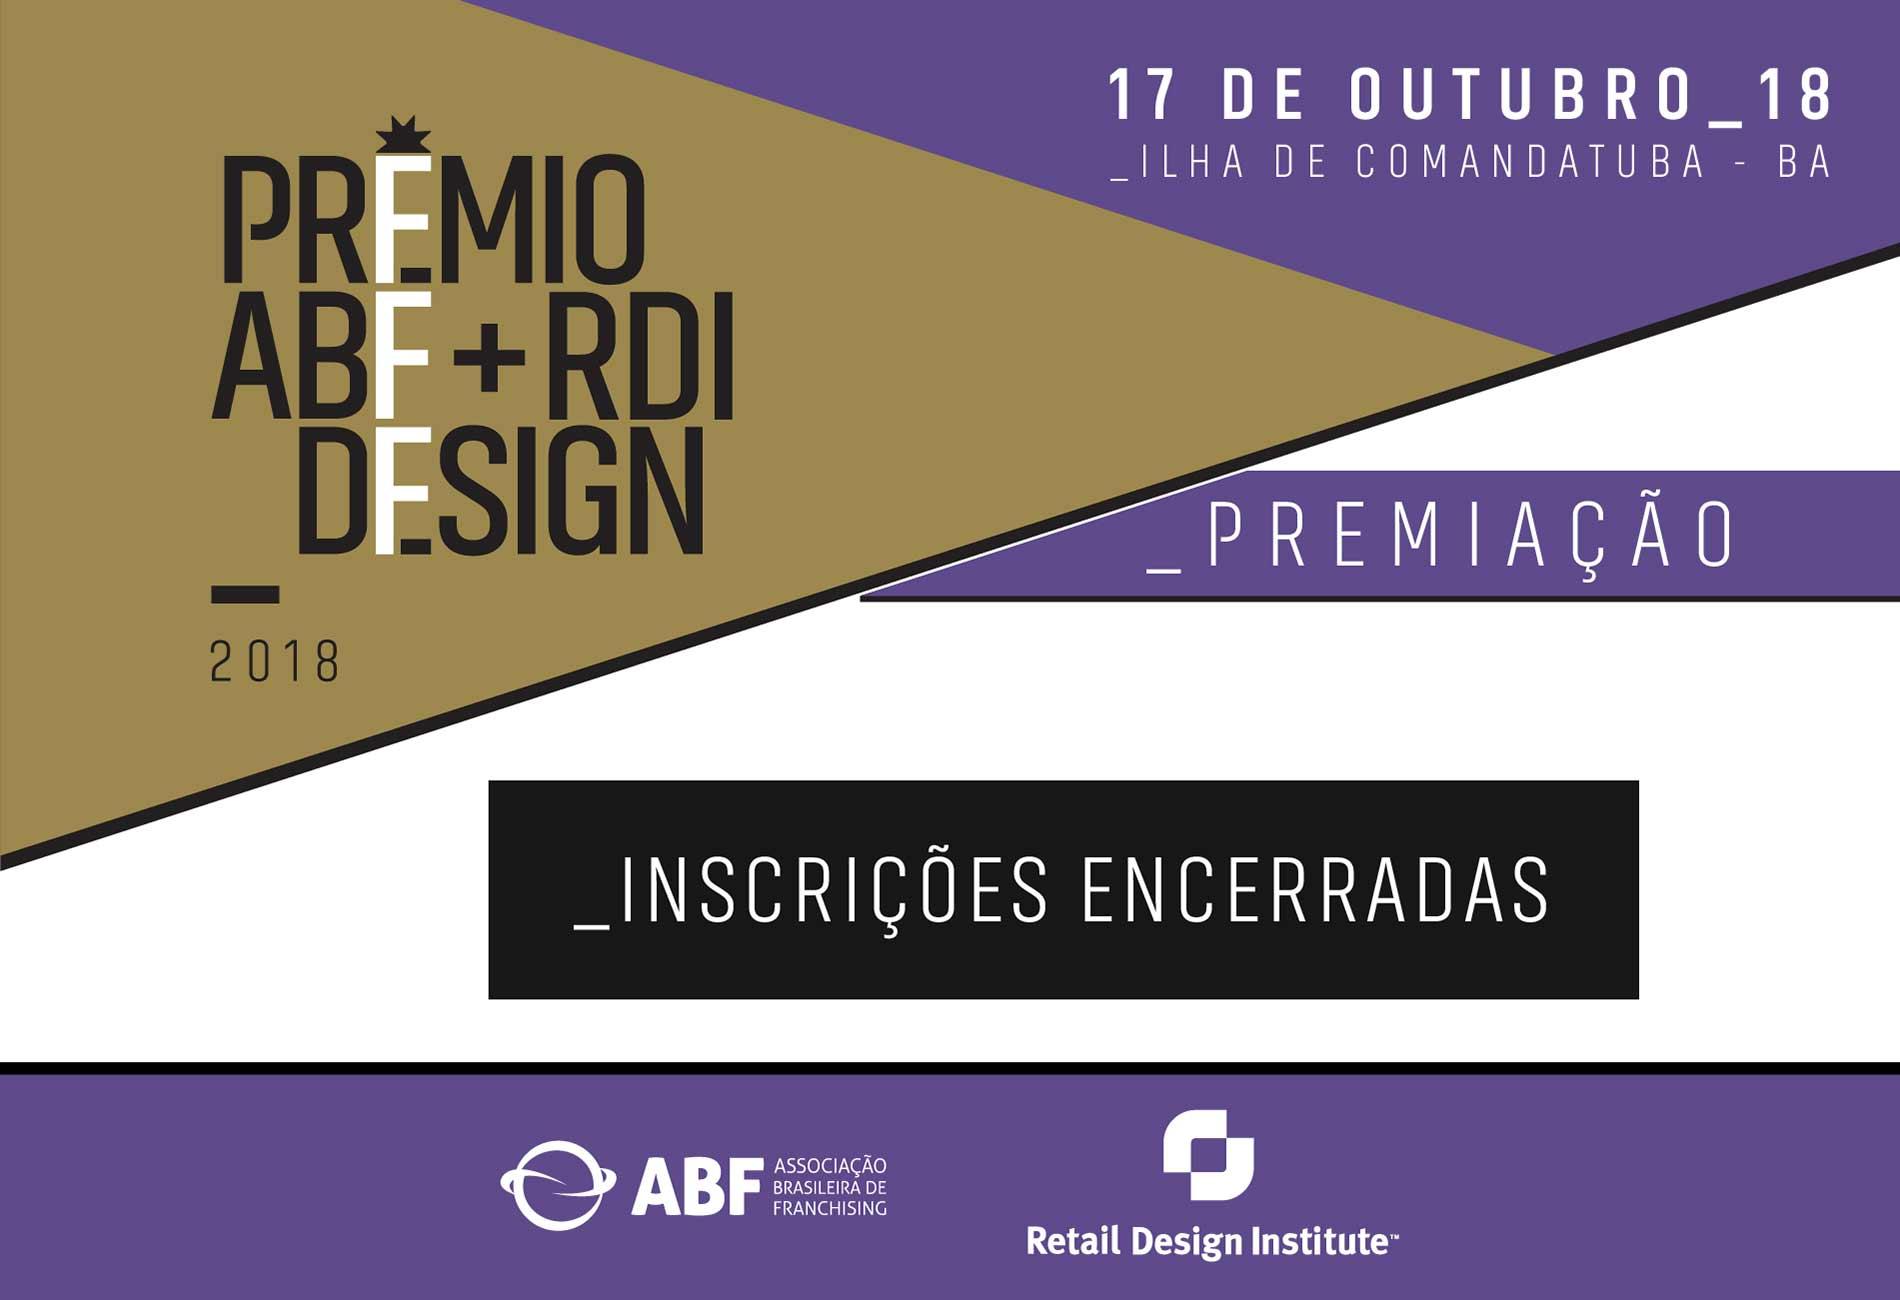 Prêmio ABF + RDI Design